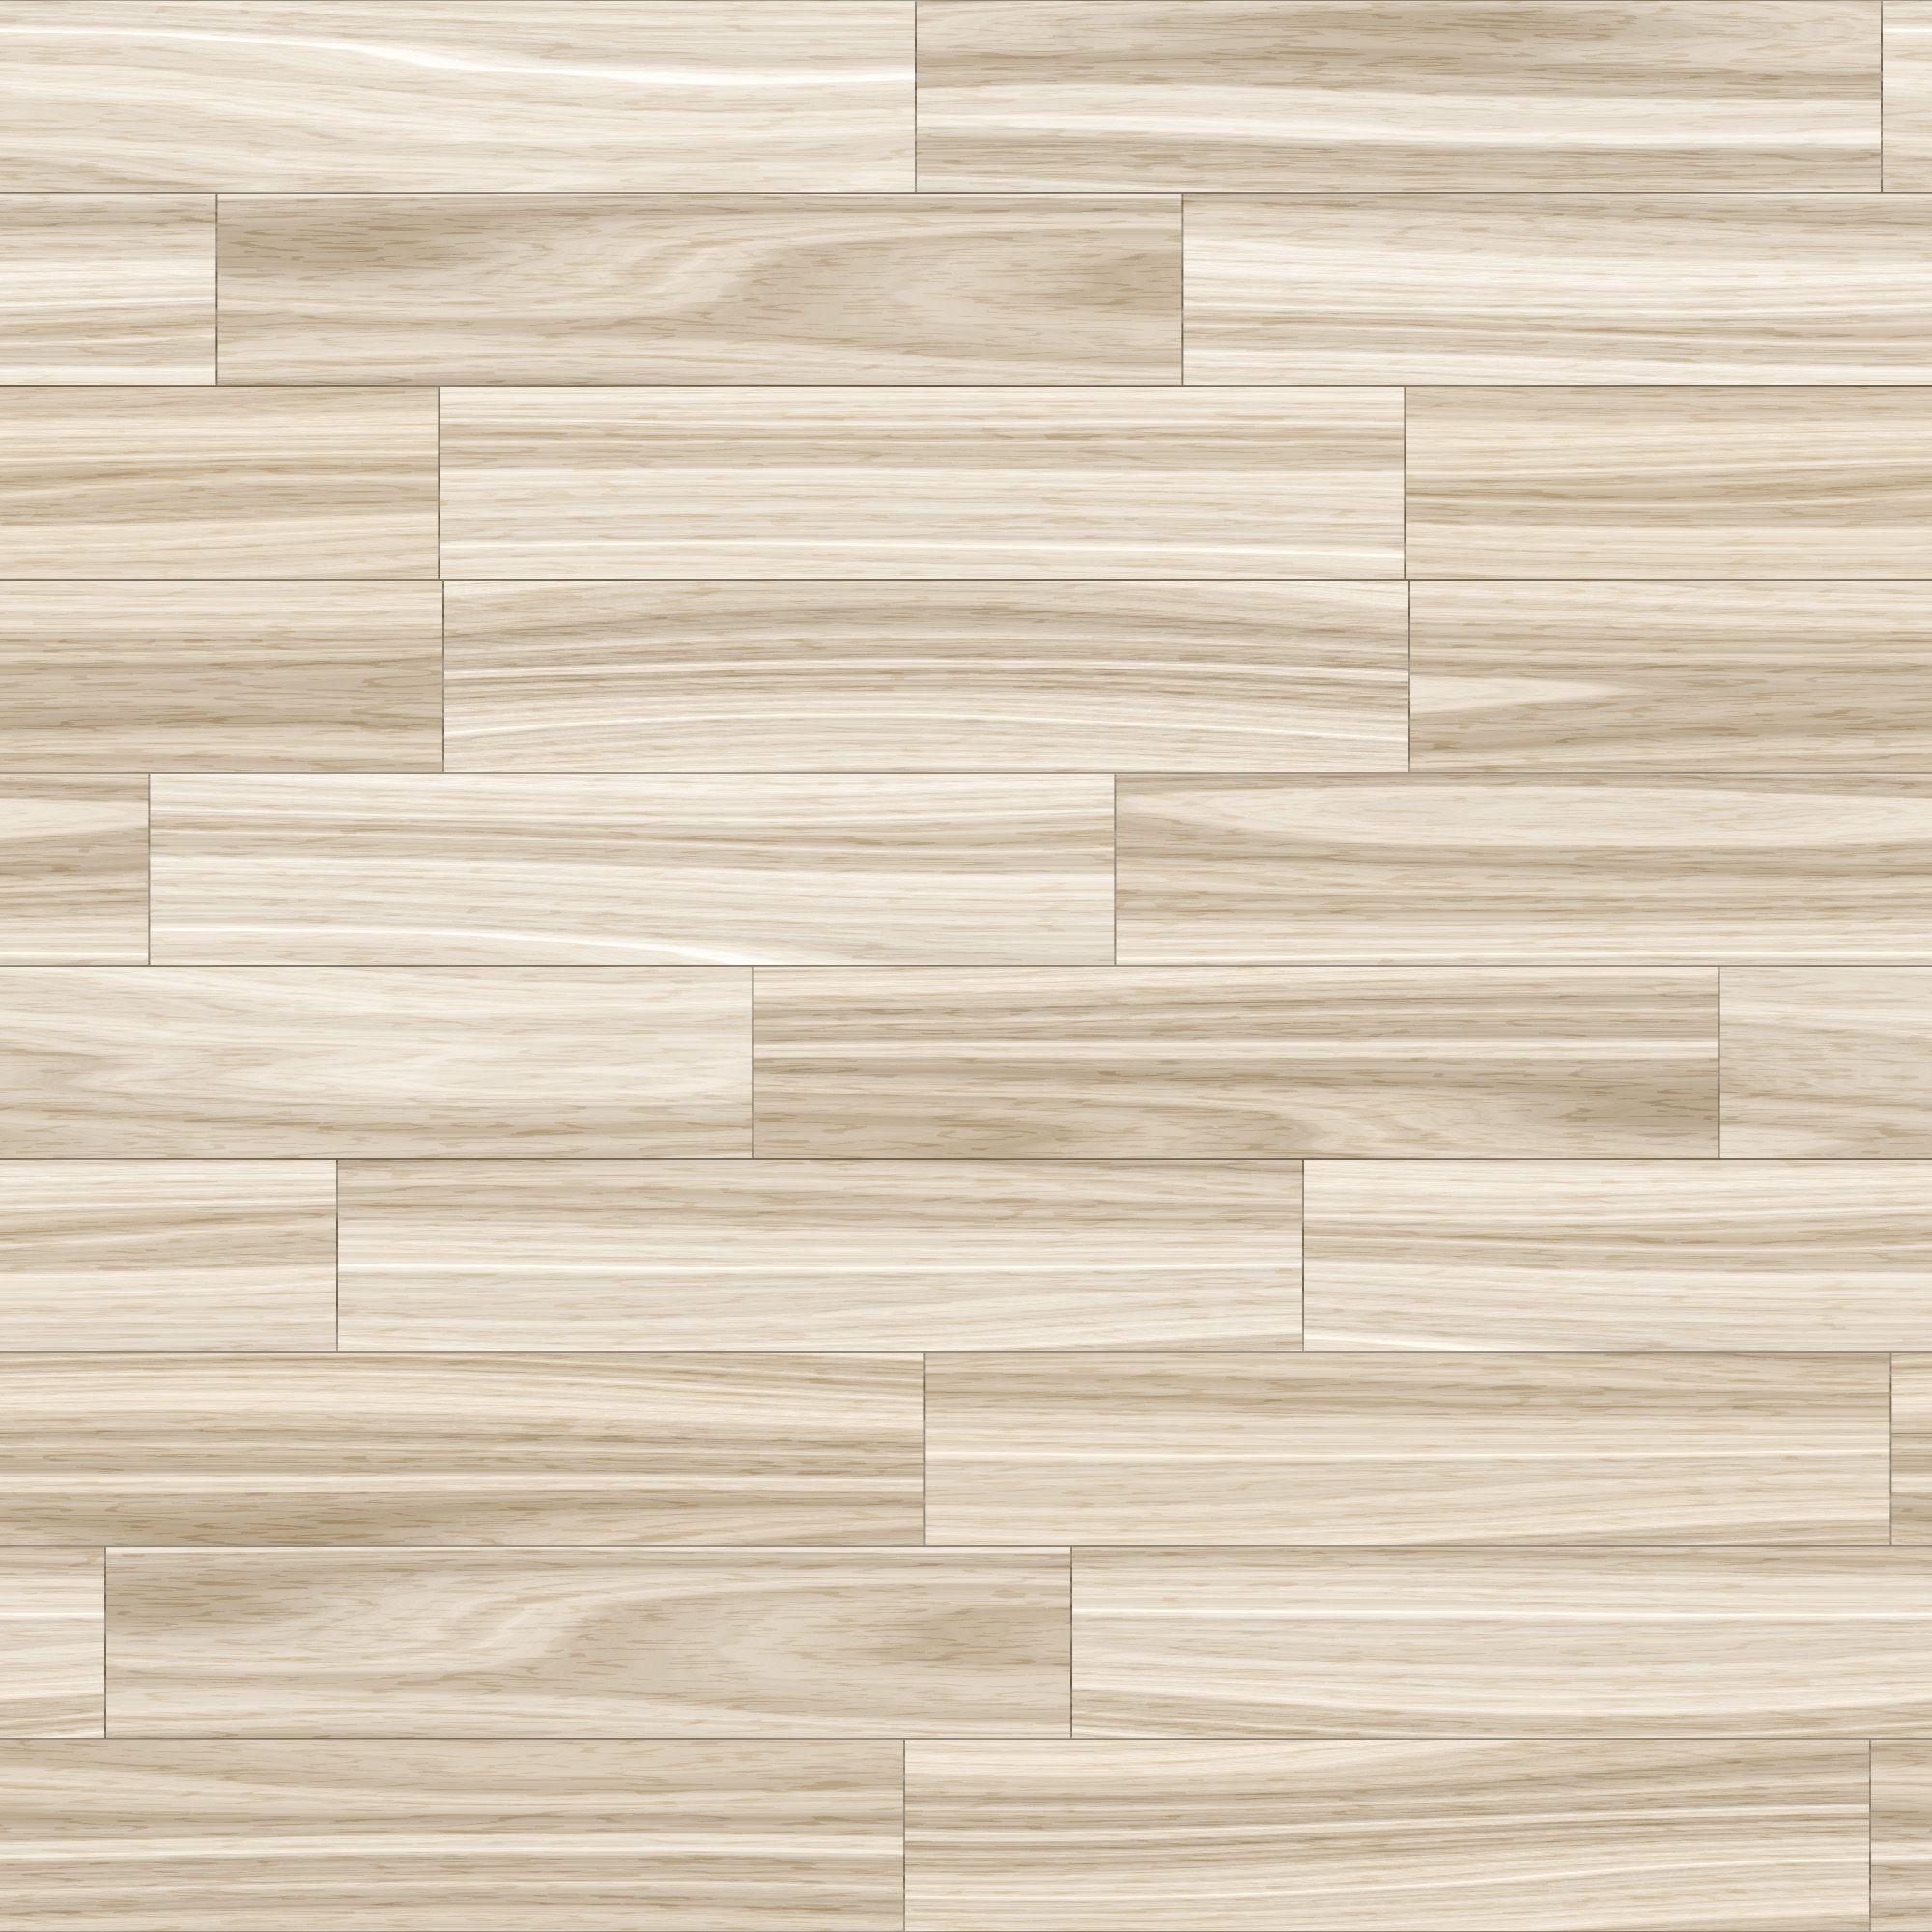 2000x2000 Grey Brown Seamless Wooden Flooring Texture